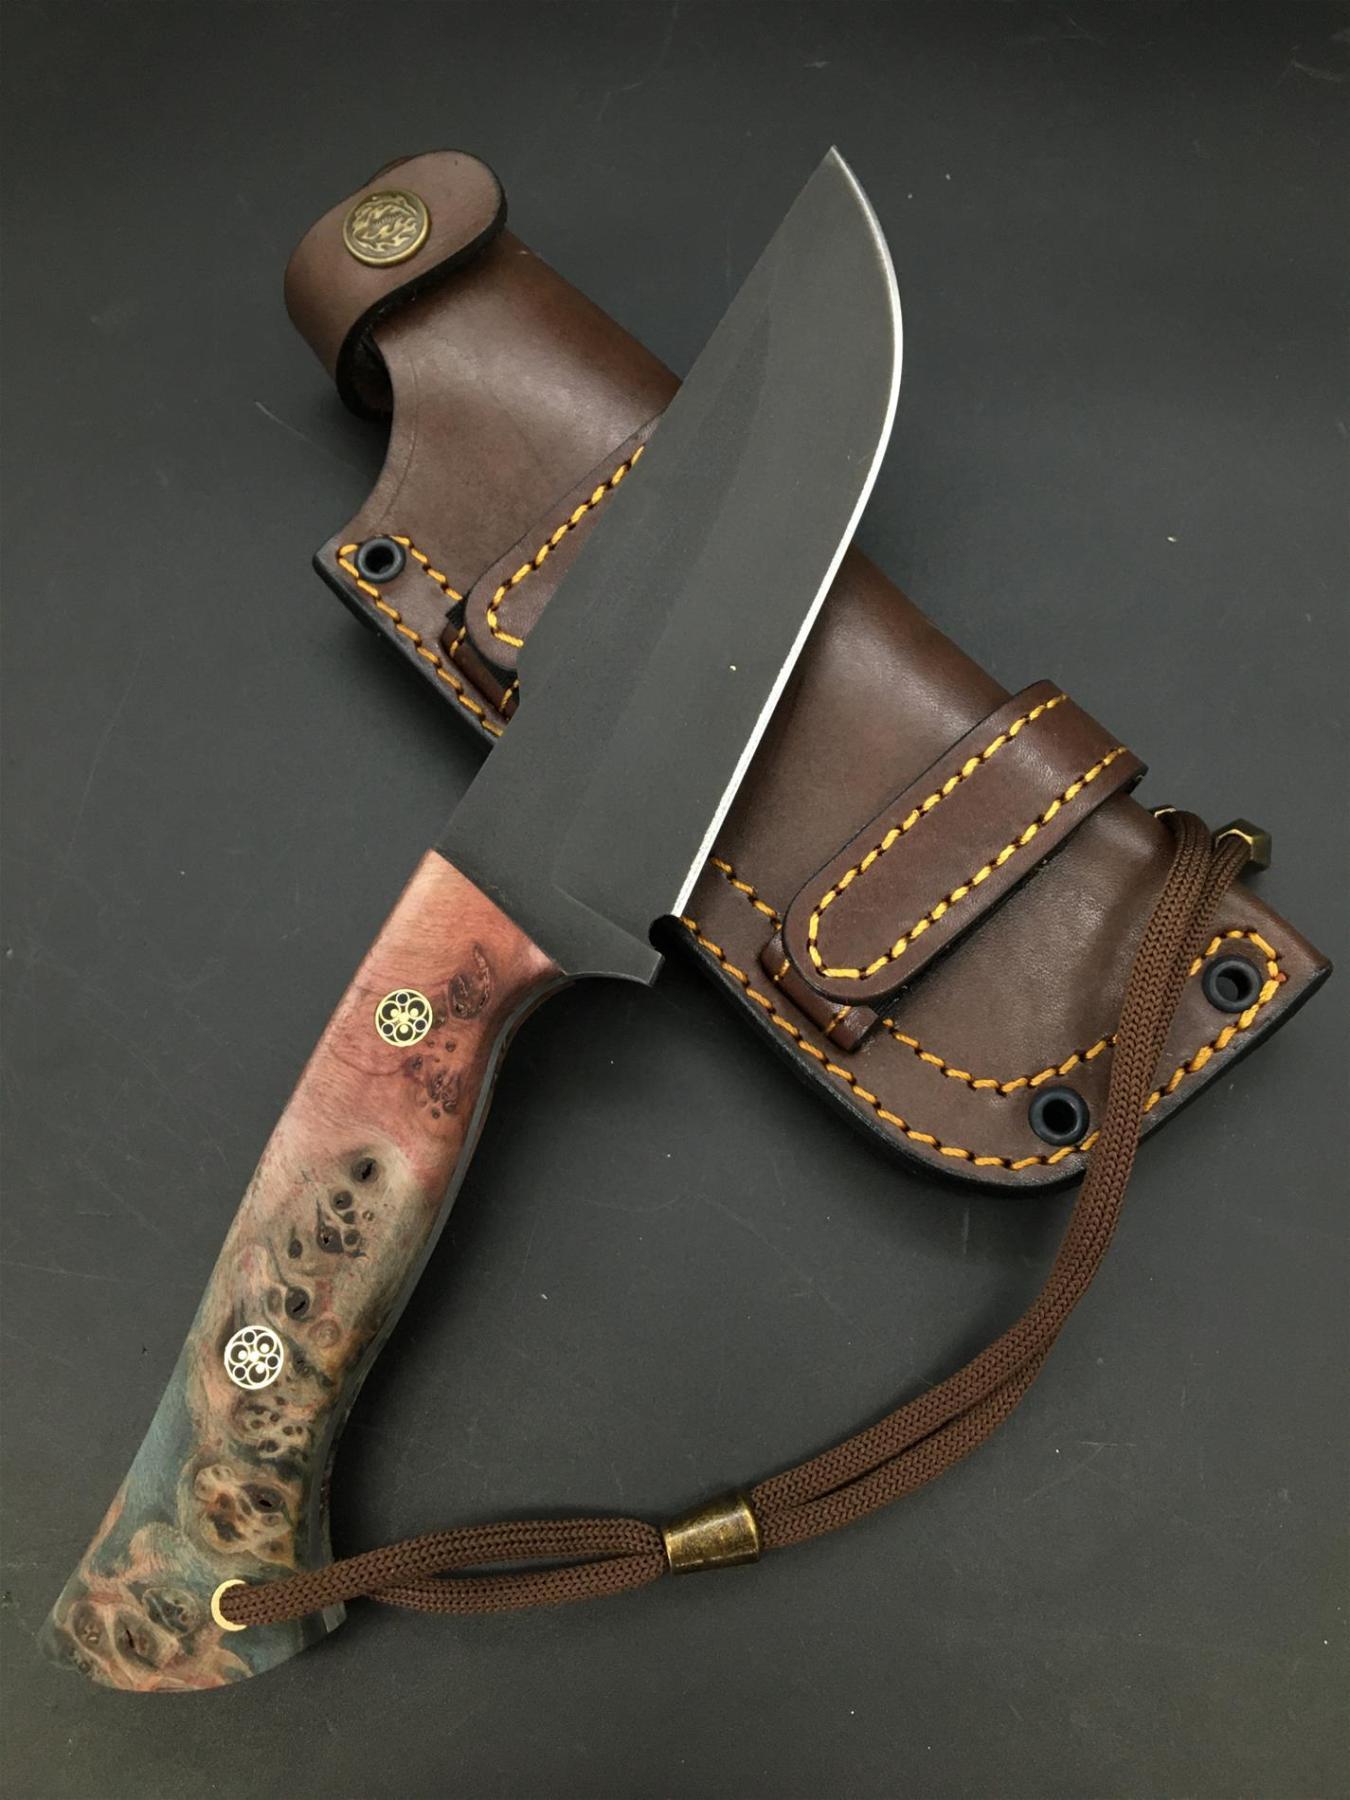 Handmade Uddeholm Sleipner Knife TK81 enlarge